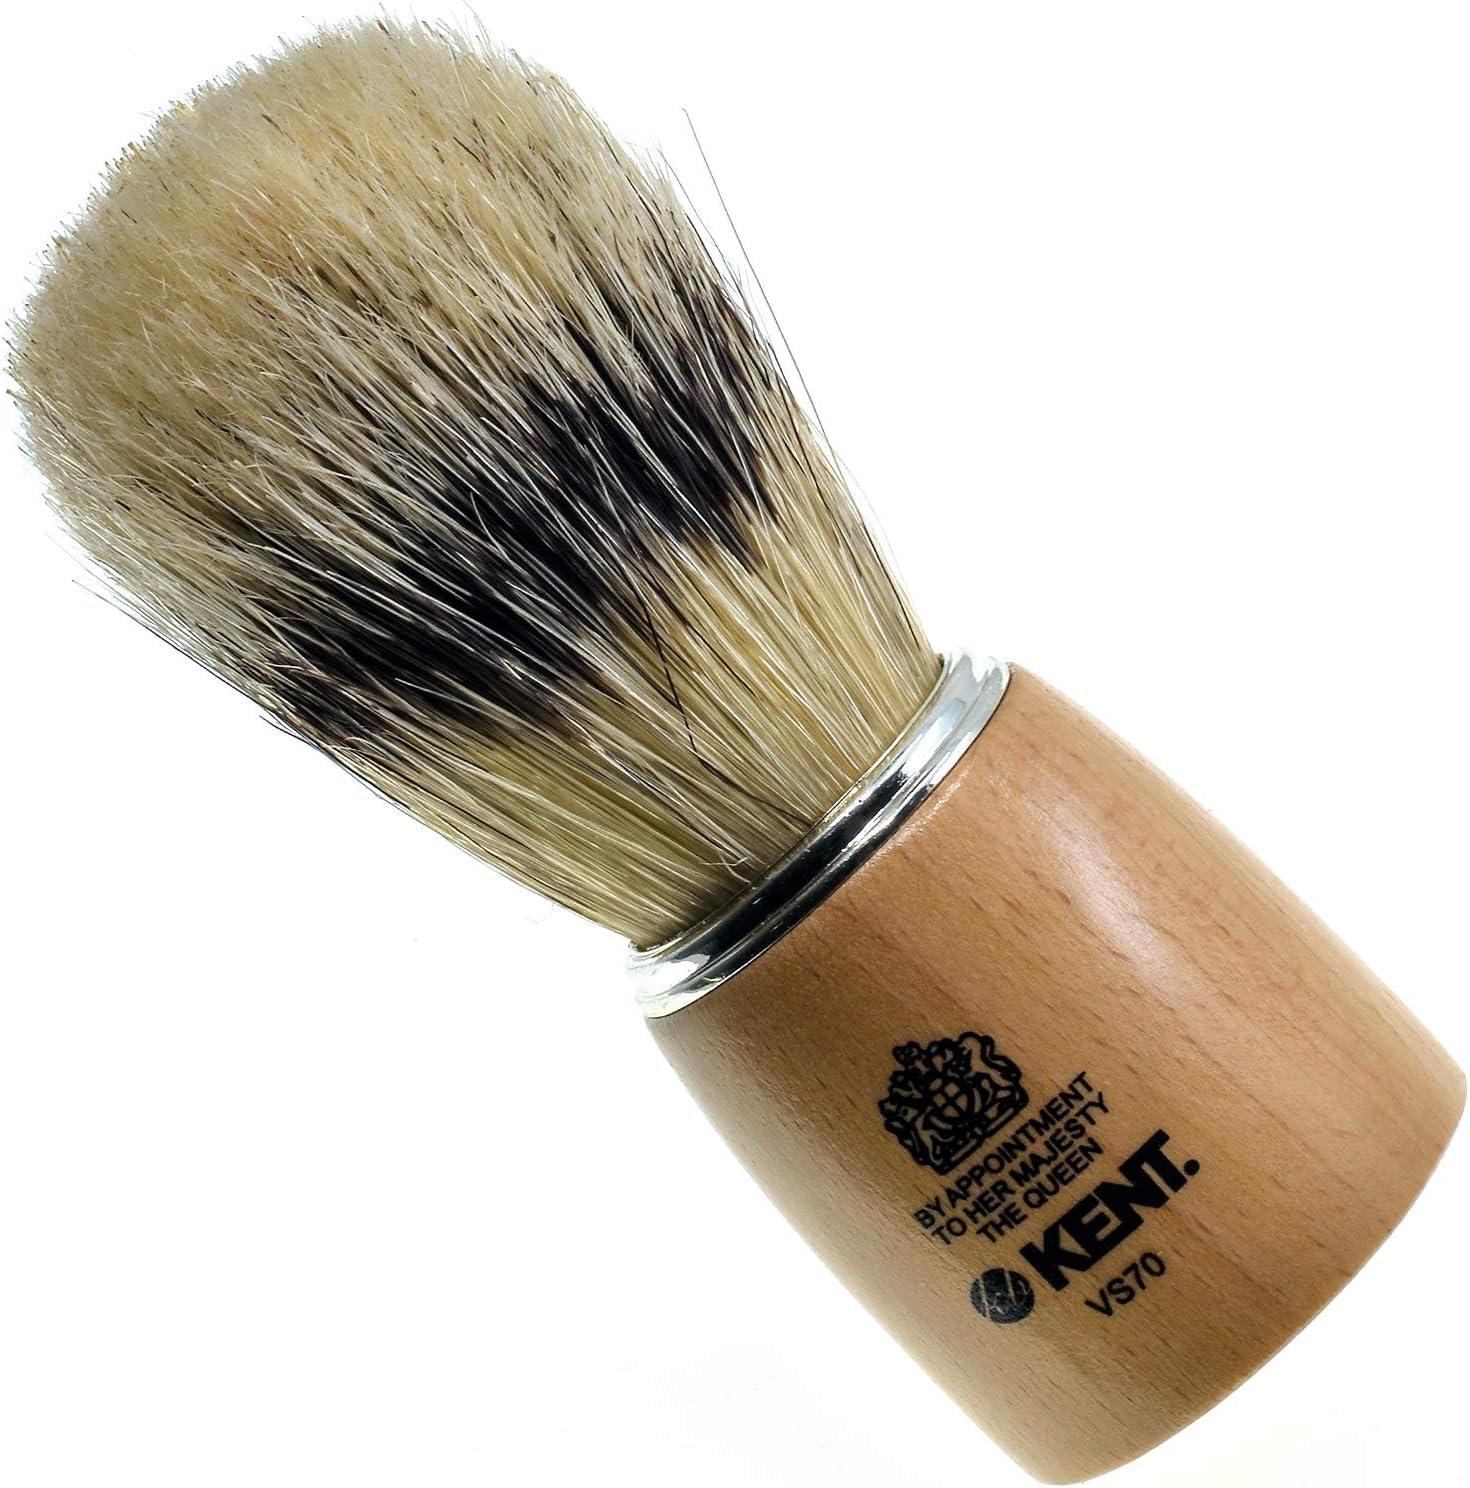 Kent VS70 Manufacturer regenerated product Natural Badger Bristle M Shaving Brush Kit for A surprise price is realized